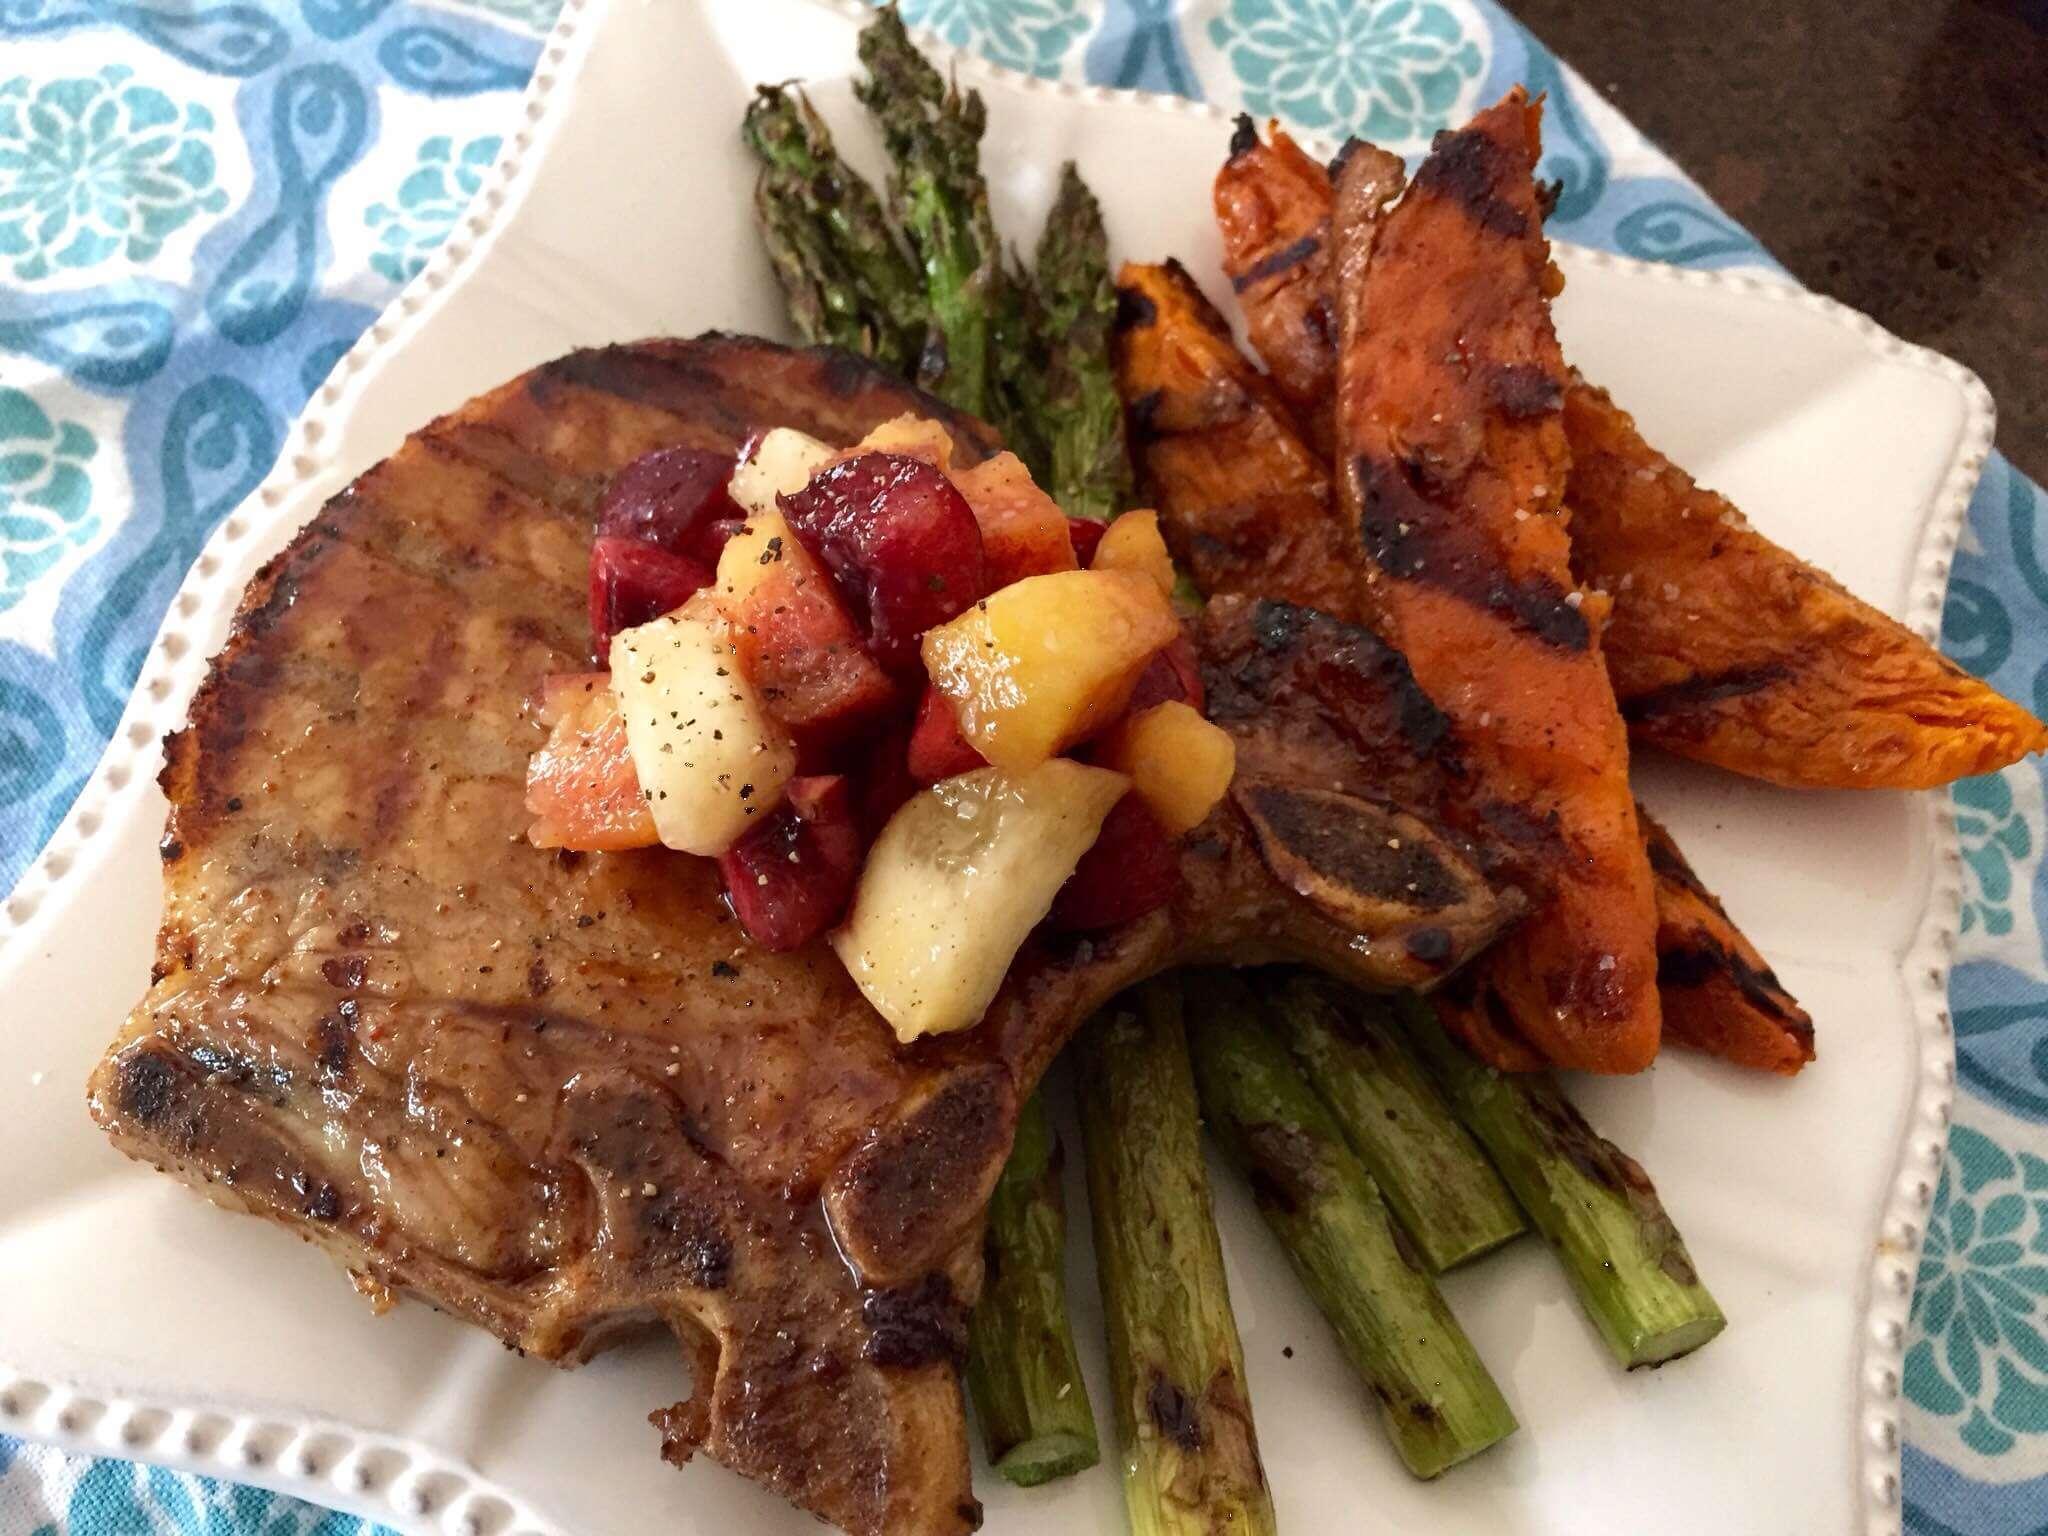 Sweet Tea Brined Pork Chops with Maple-Bourbon Glaze